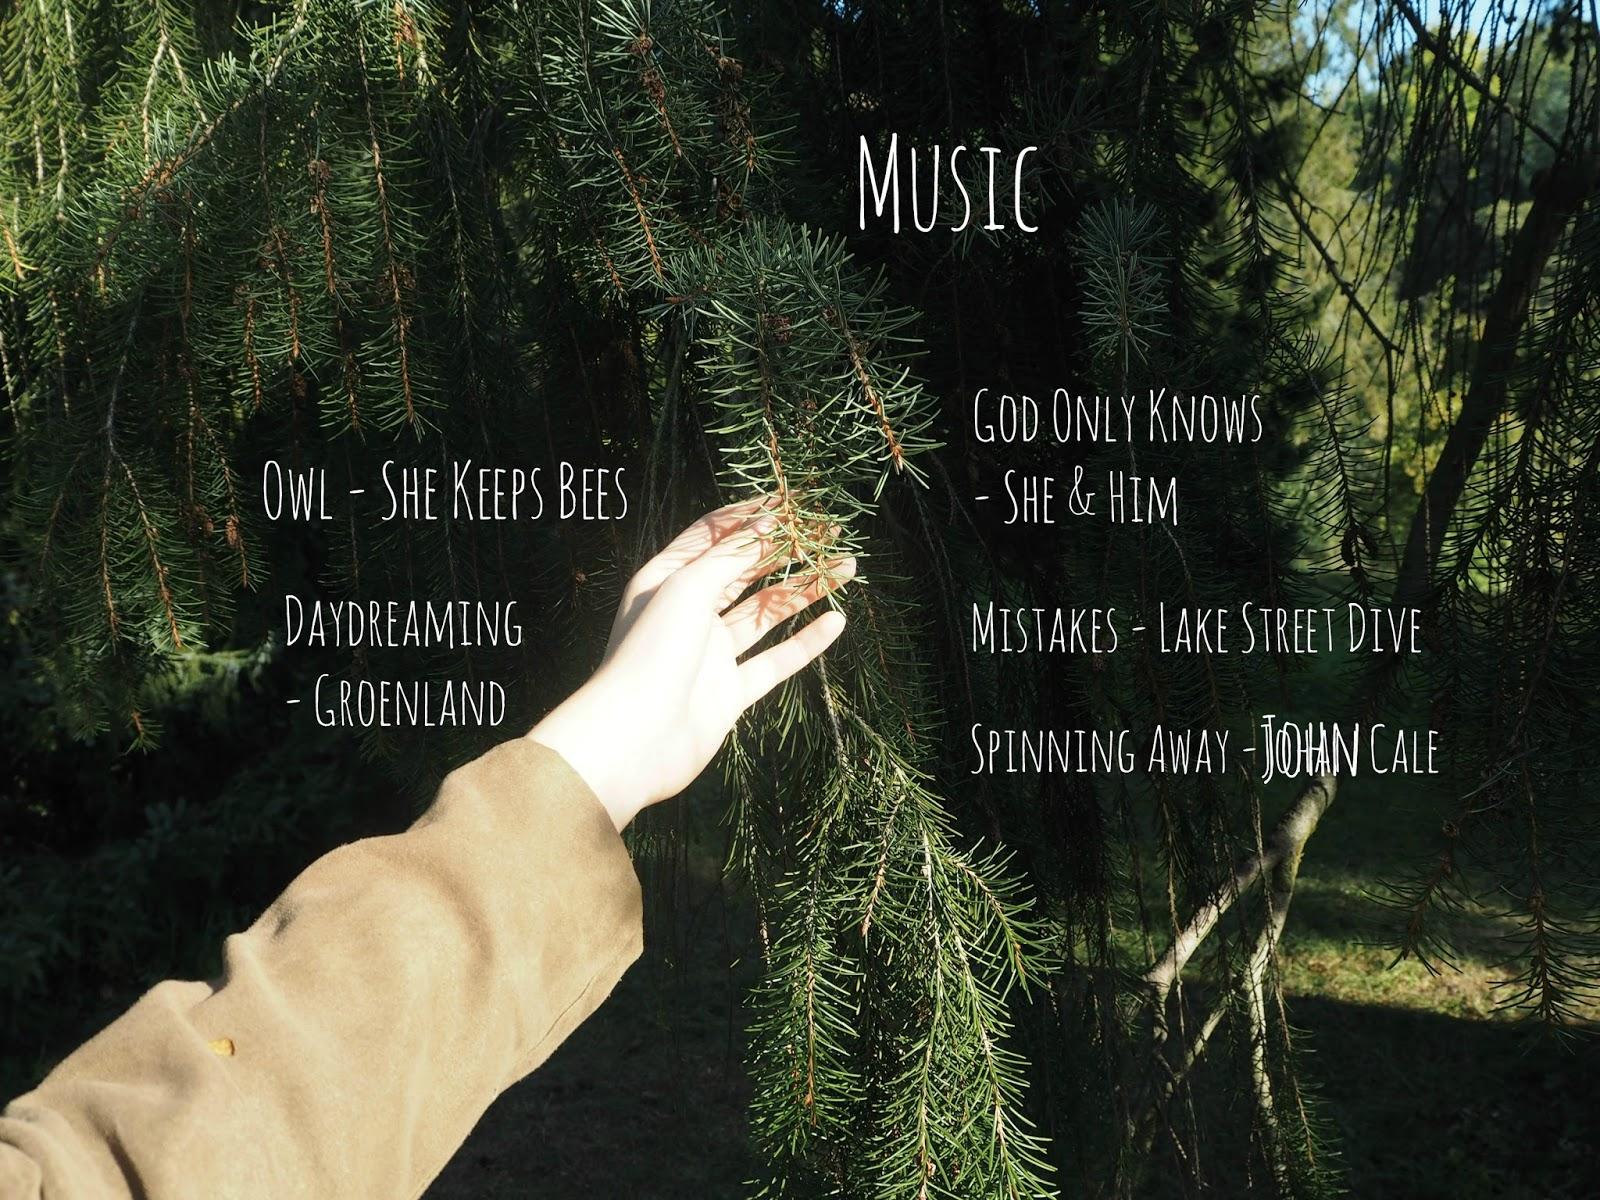 Nature 39 s wonders pumpkin soup tea and music - Lake street dive mistakes ...